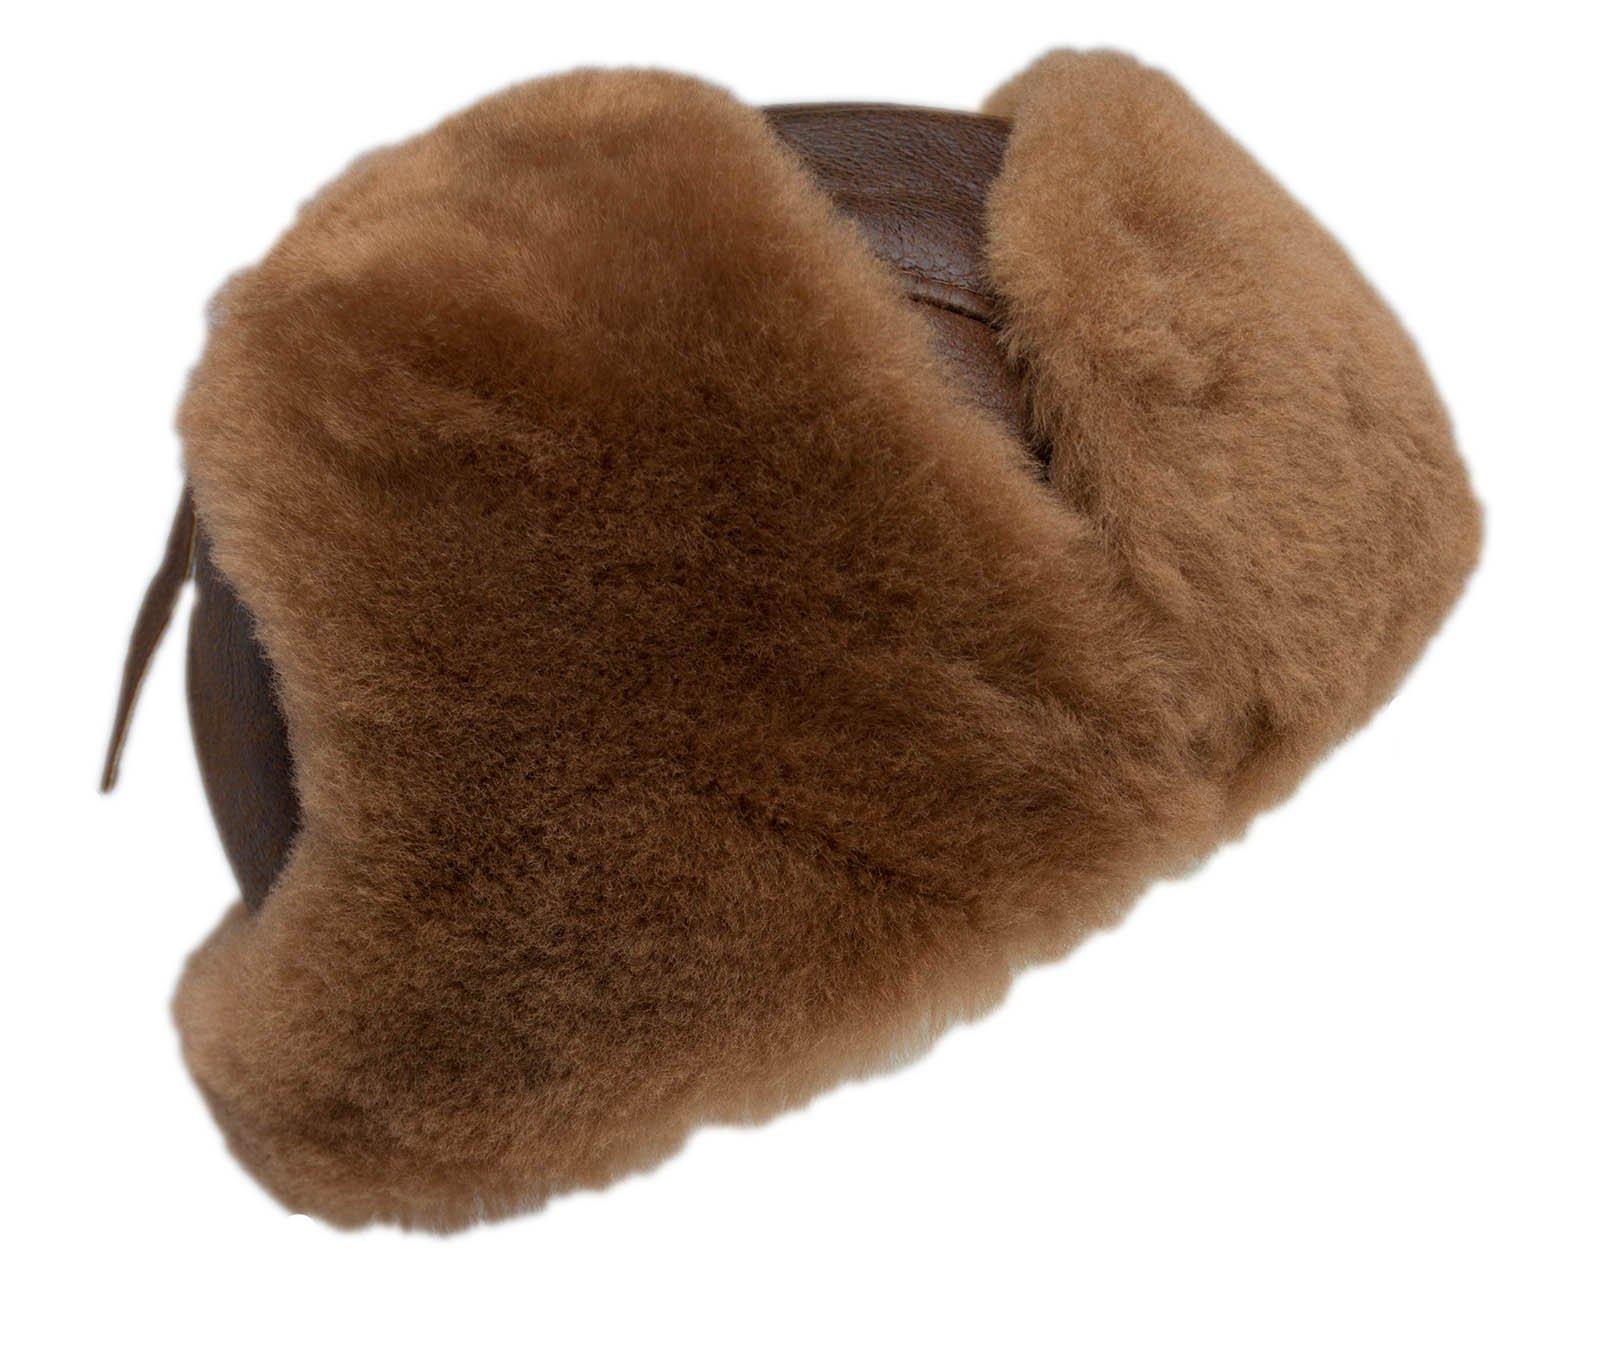 buyfurhat Women's Trapper Ushanka Aviator Russian Sheepskin Hat (XL, Peach Brown) by buyfurhat (Image #2)